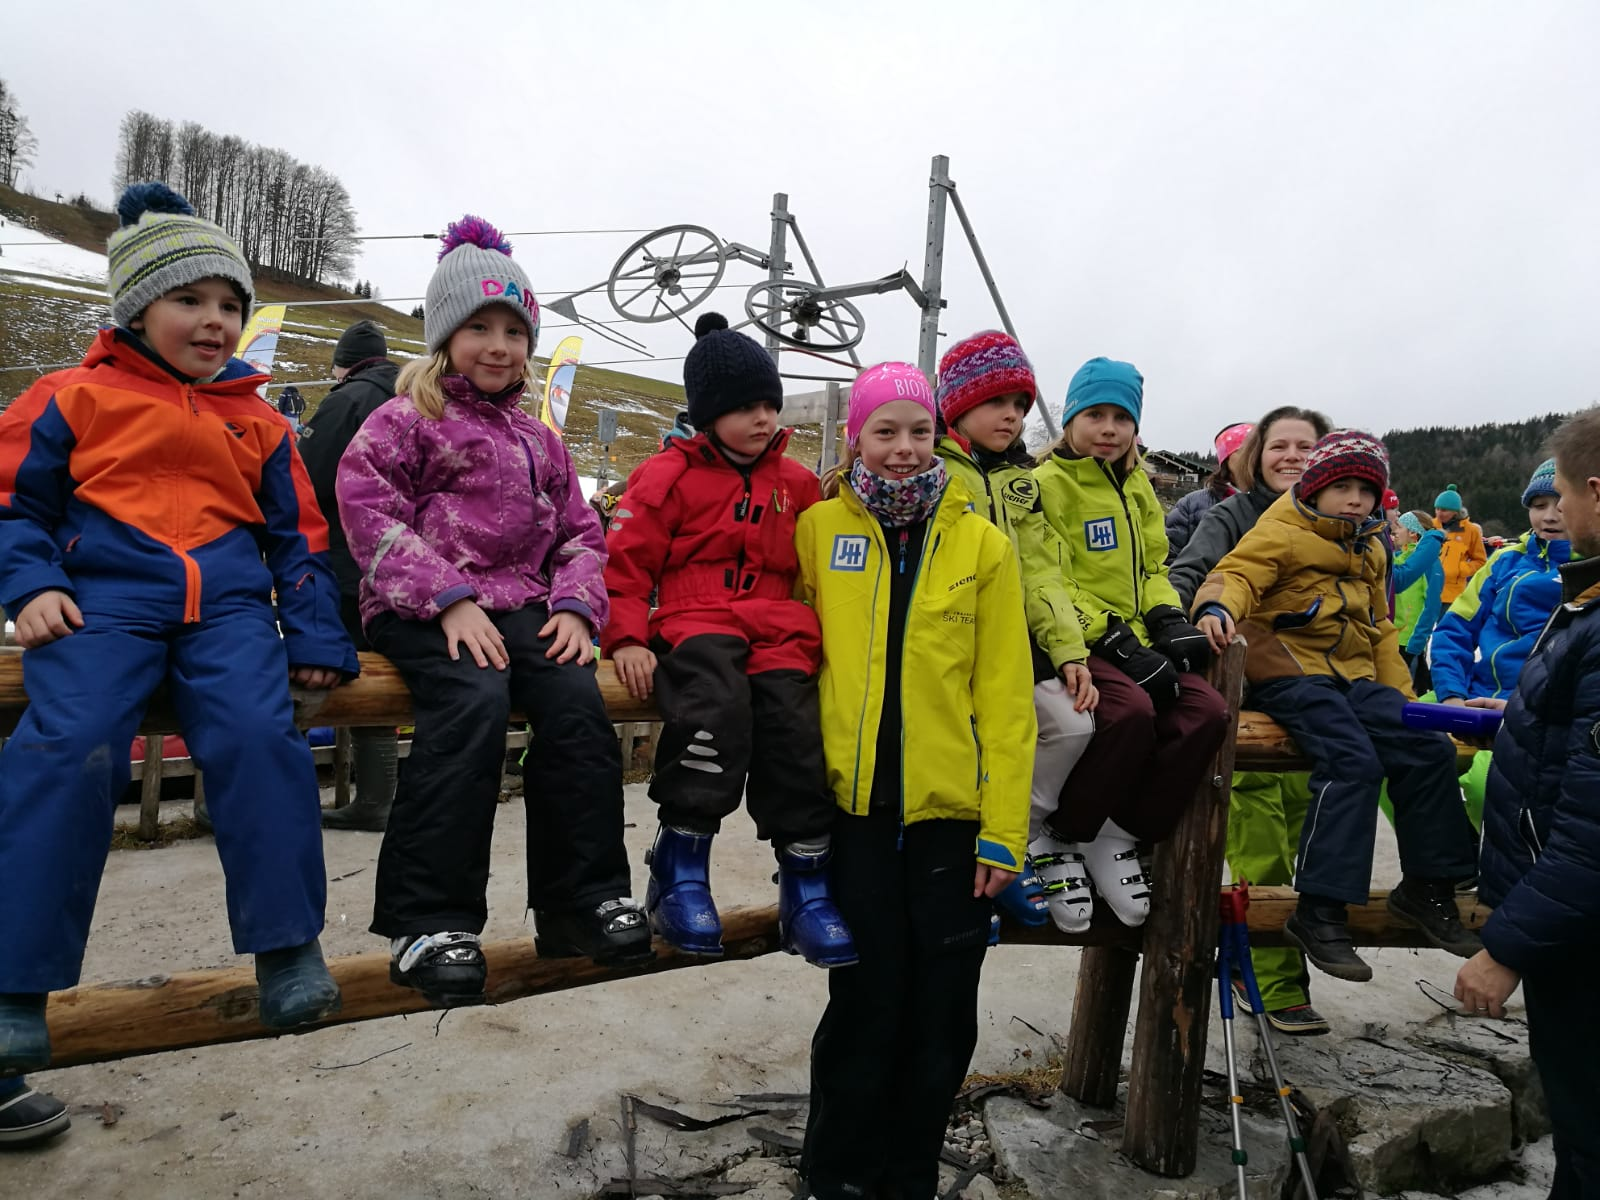 4. Siegsdorfer-Mammut Kinderskirennen